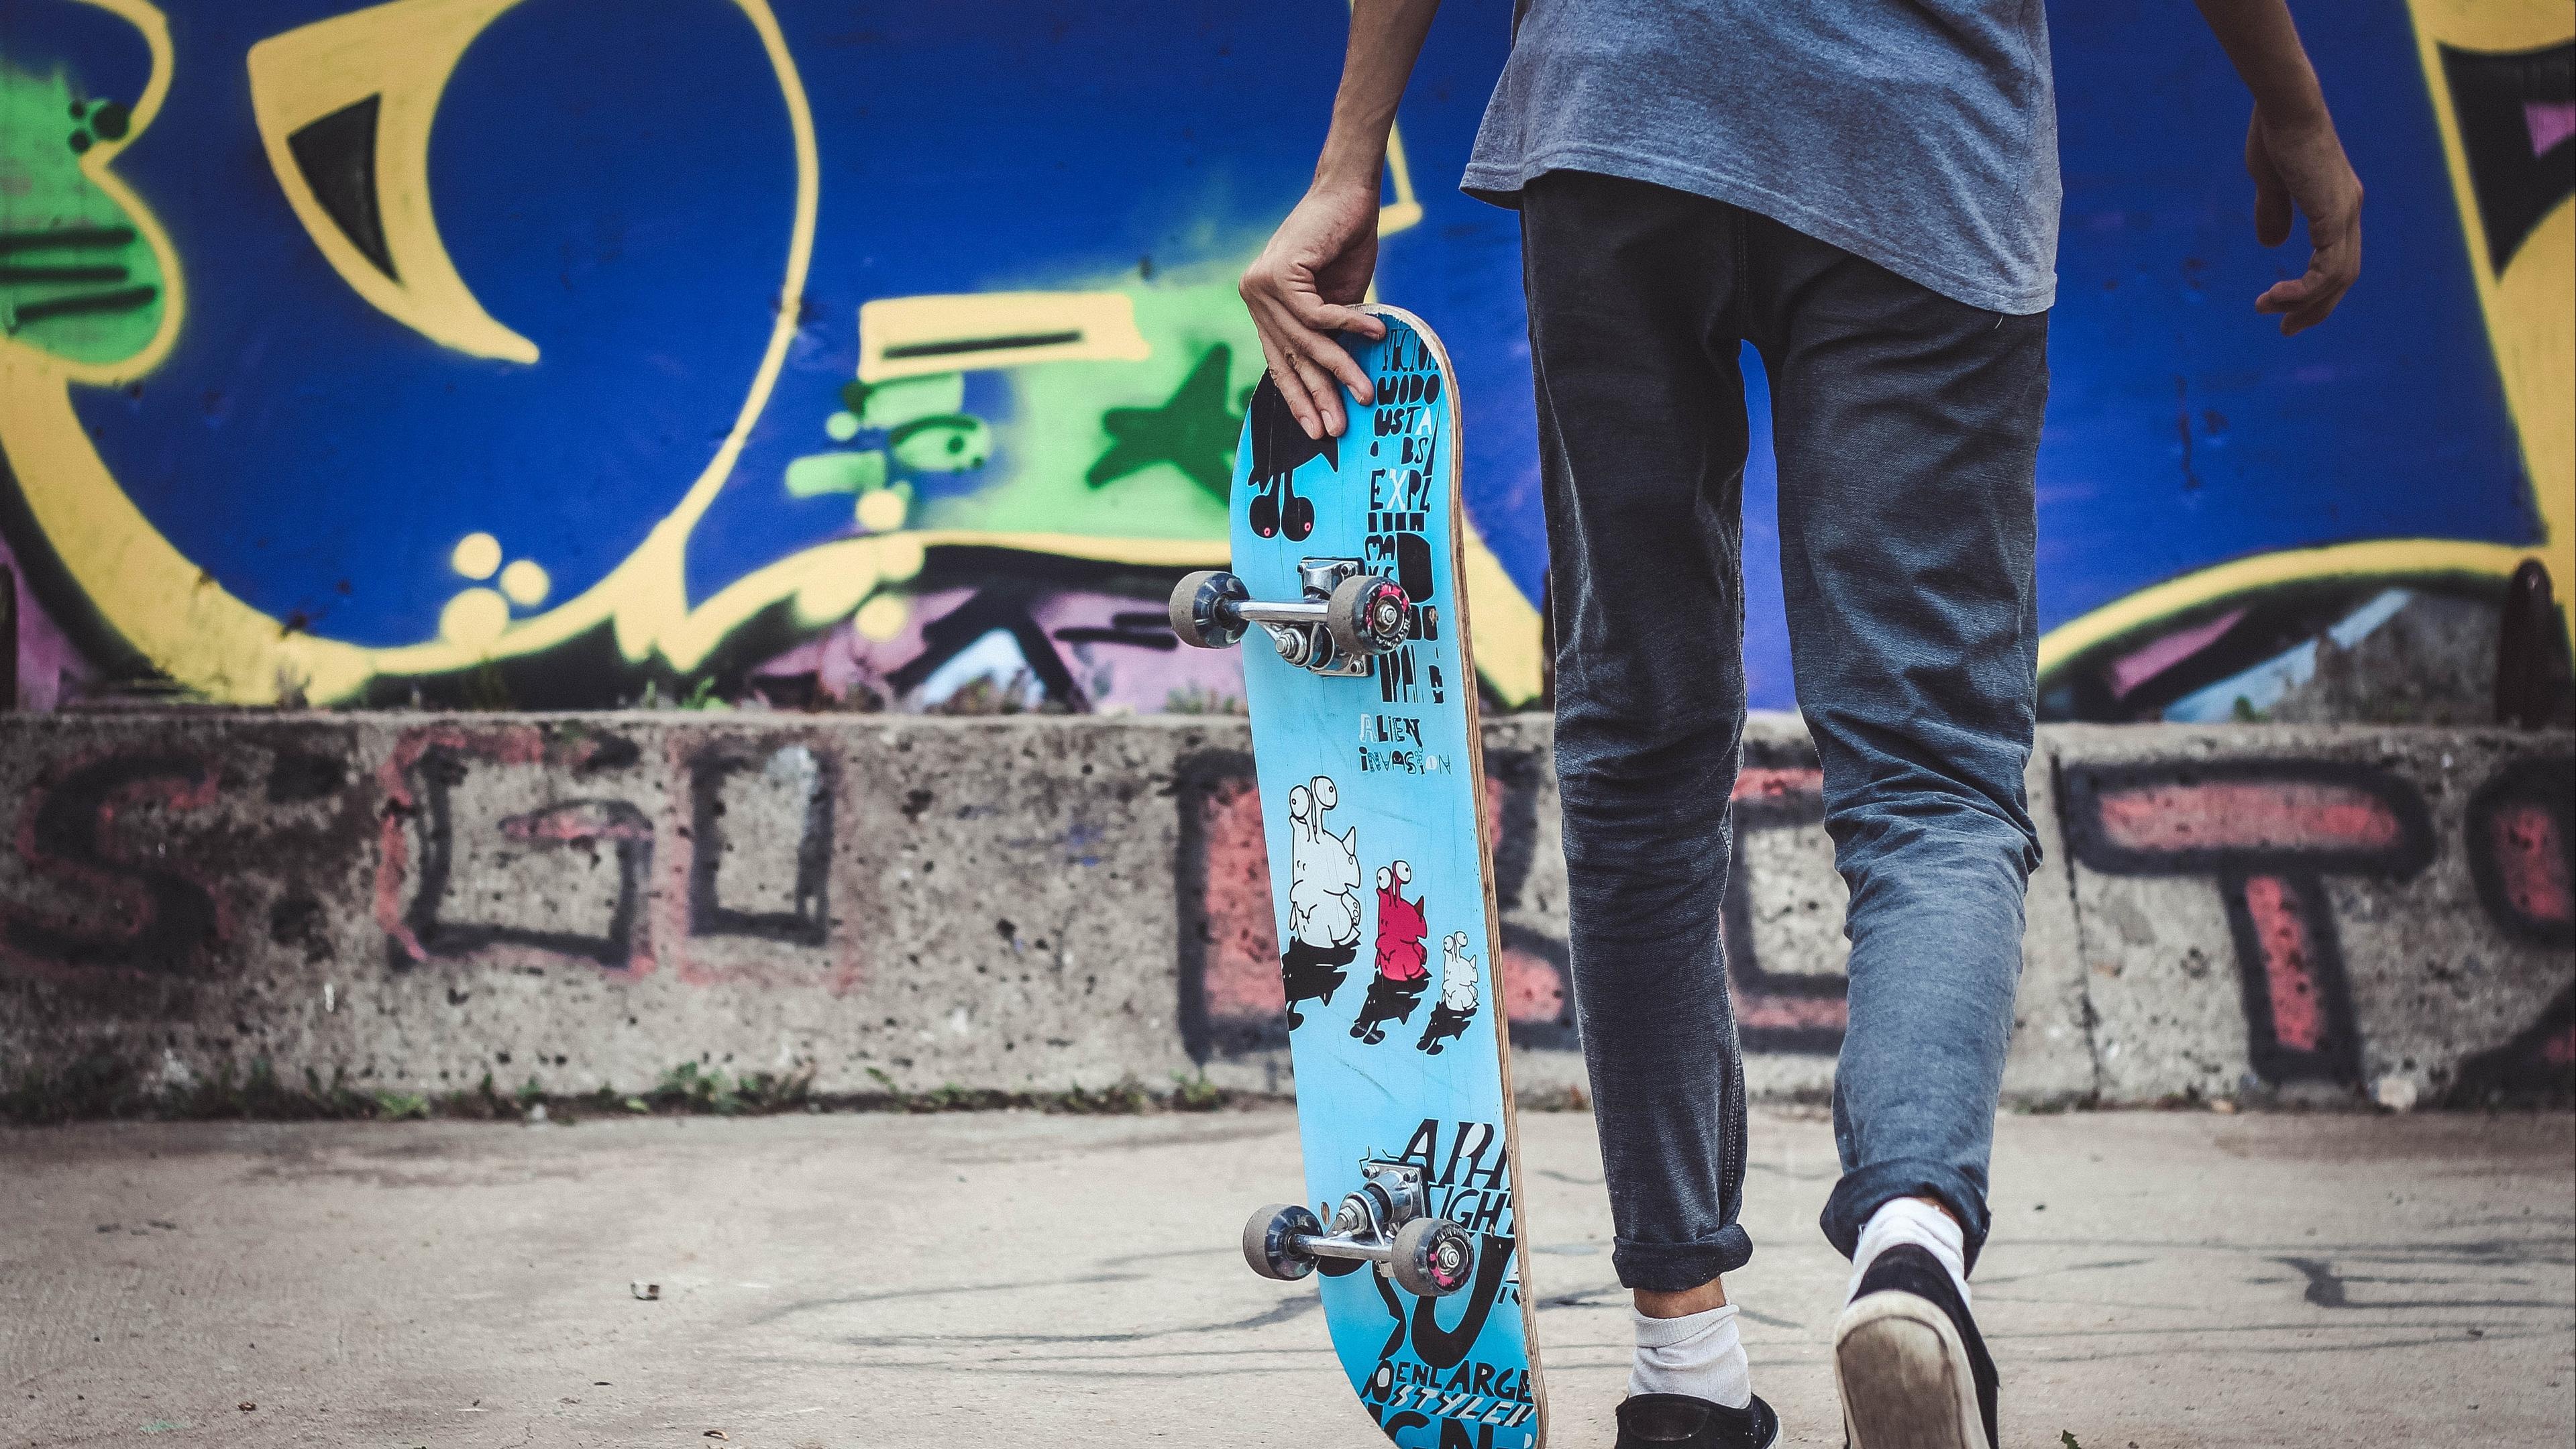 skateboard skateboarder hobby 4k 1540062063 - skateboard, skateboarder, hobby 4k - skateboarder, skateboard, hobby